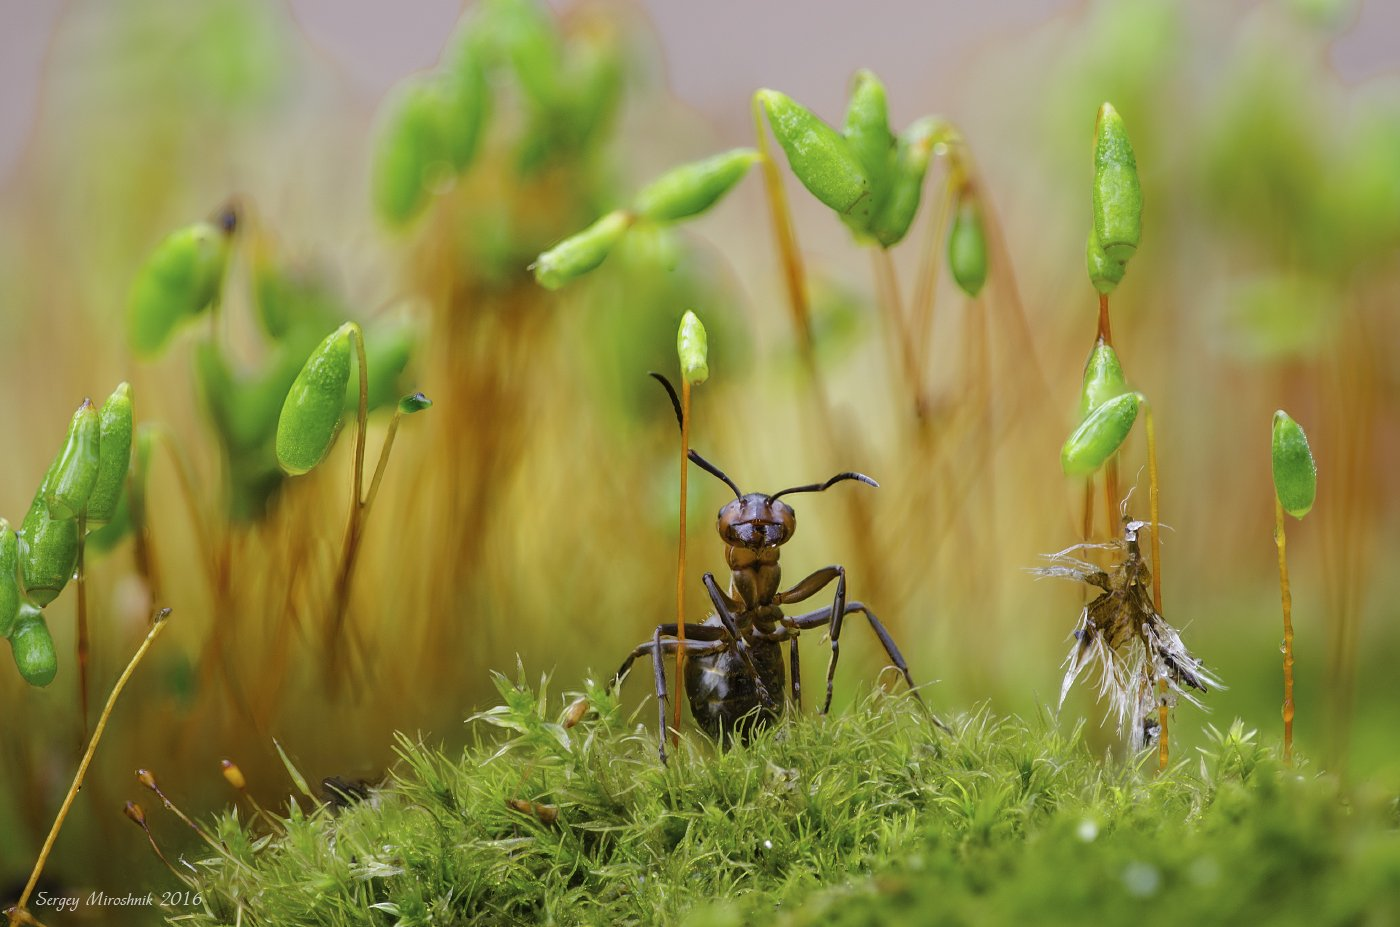 макро, муравей, насекомое, природа, мох, весна, апрель,, Сергій Мірошник